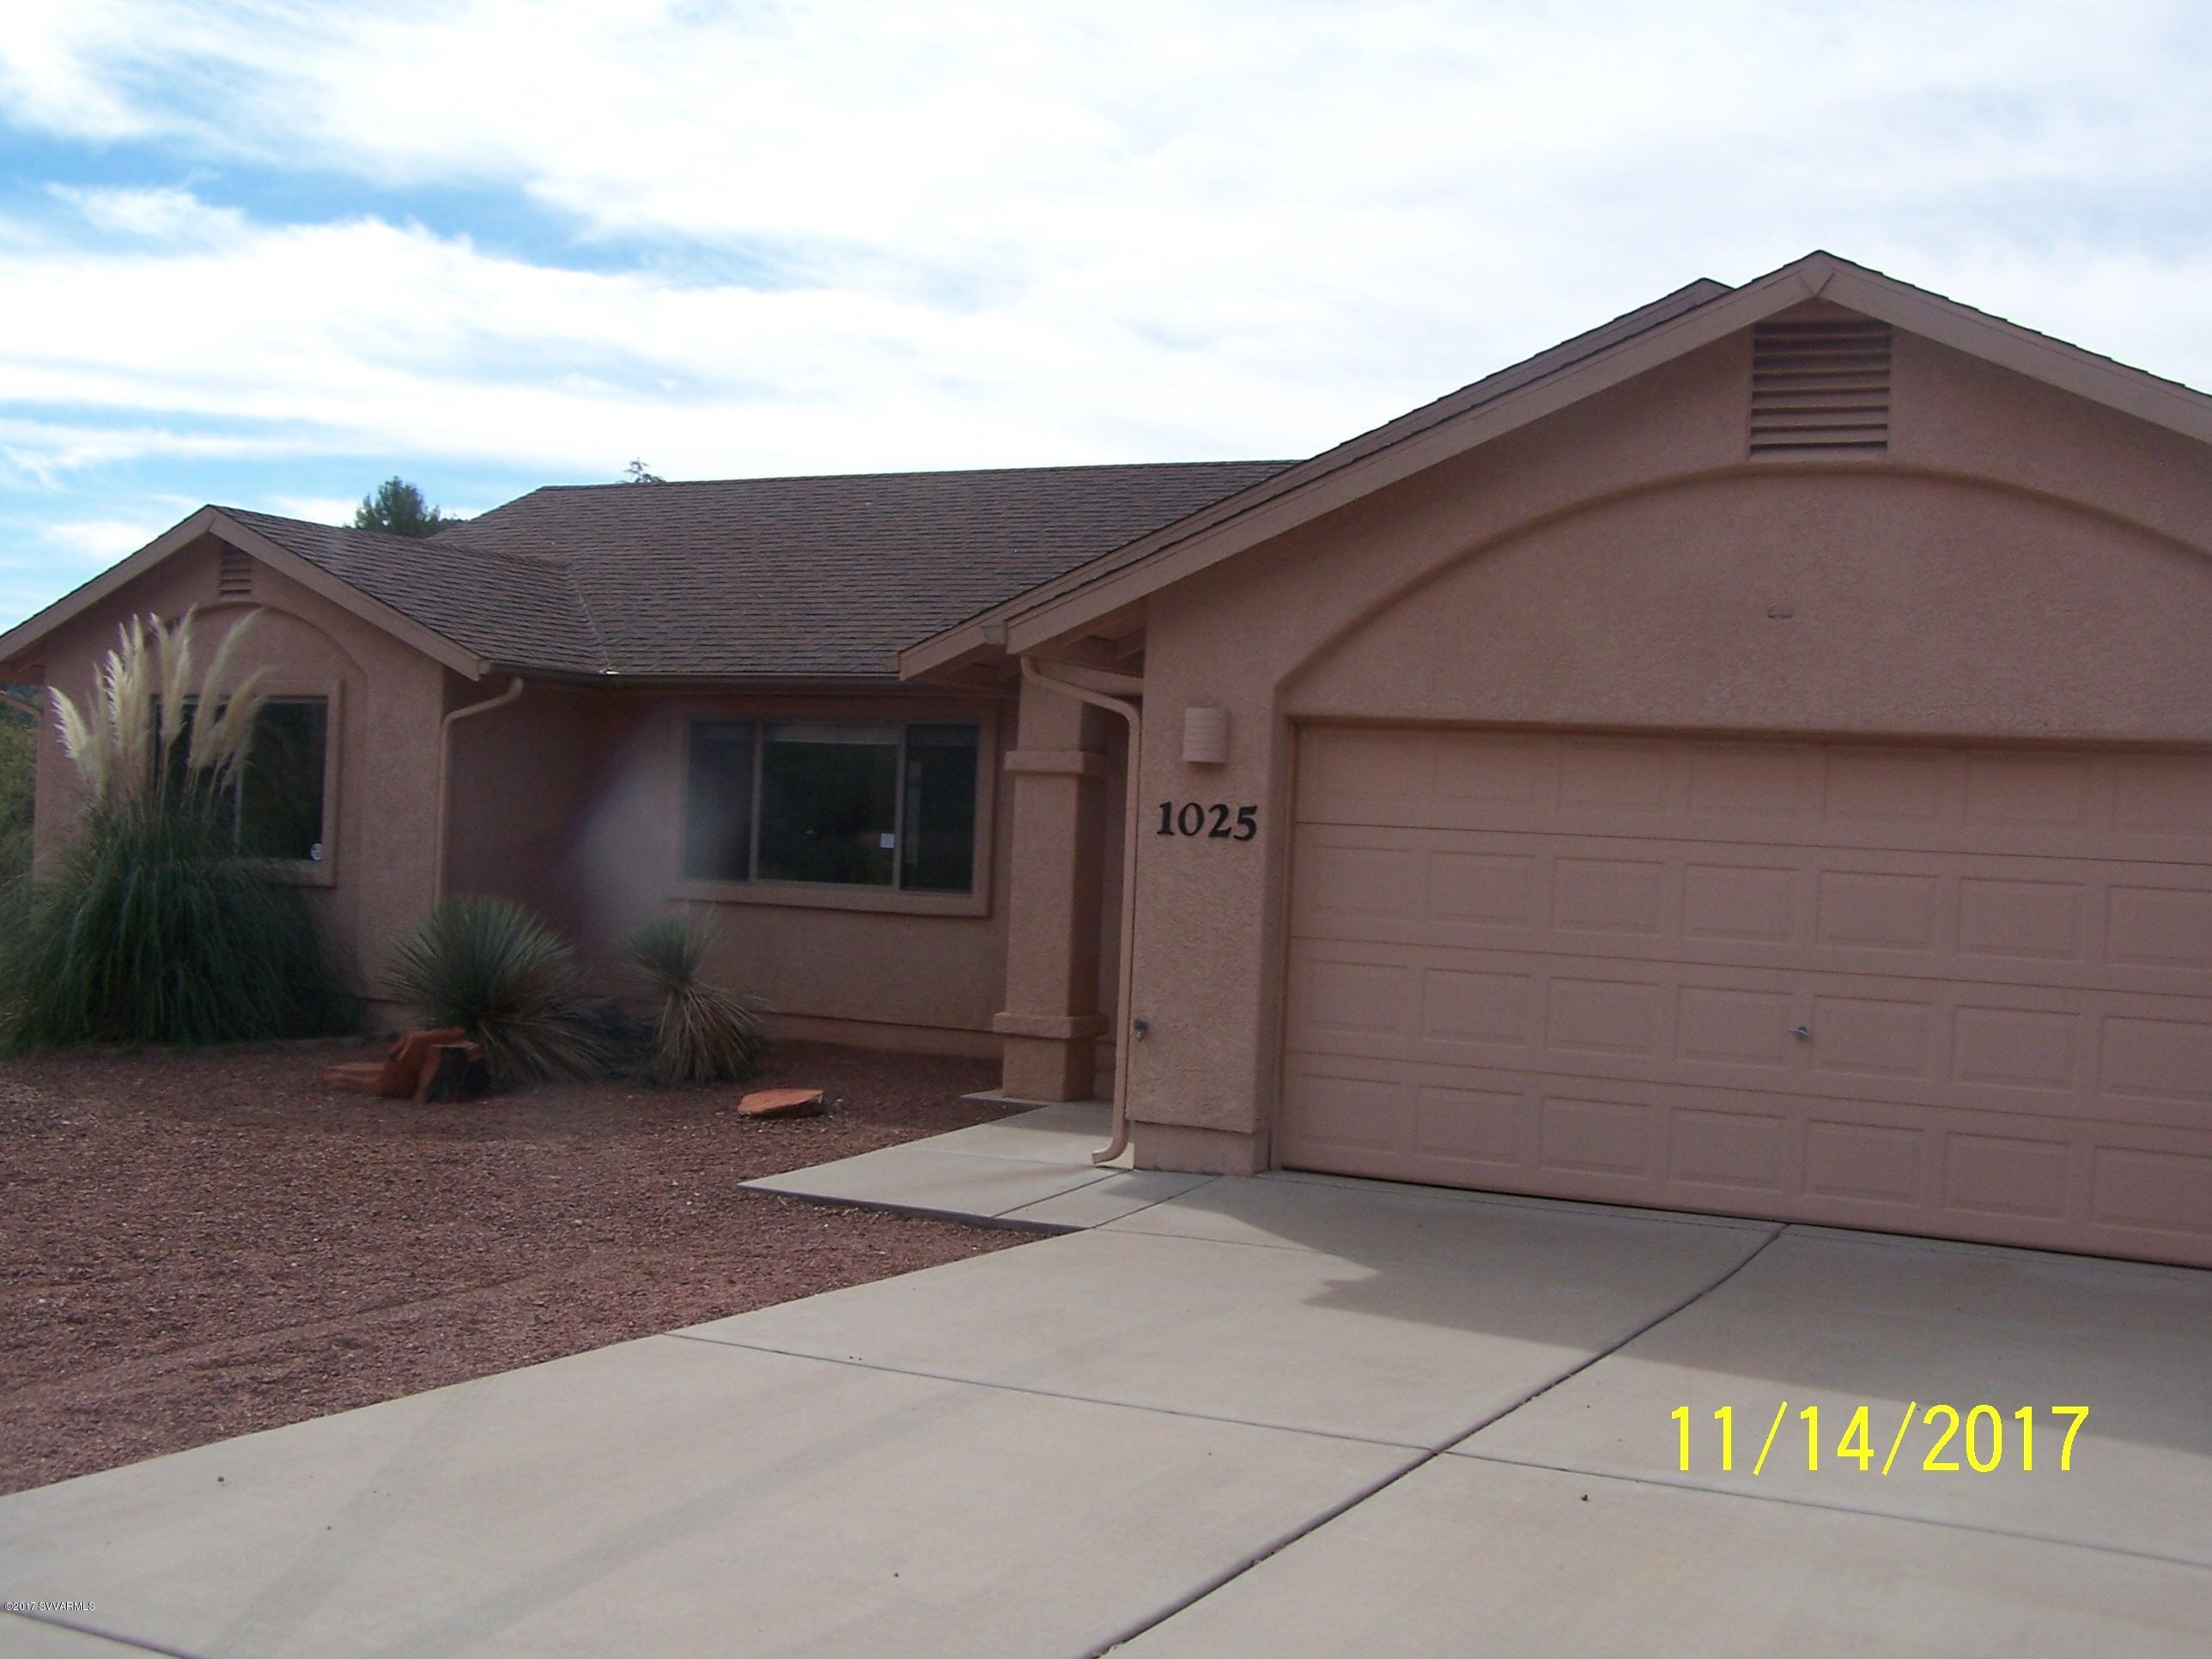 1025 Verde Valley School Sedona, AZ 86351